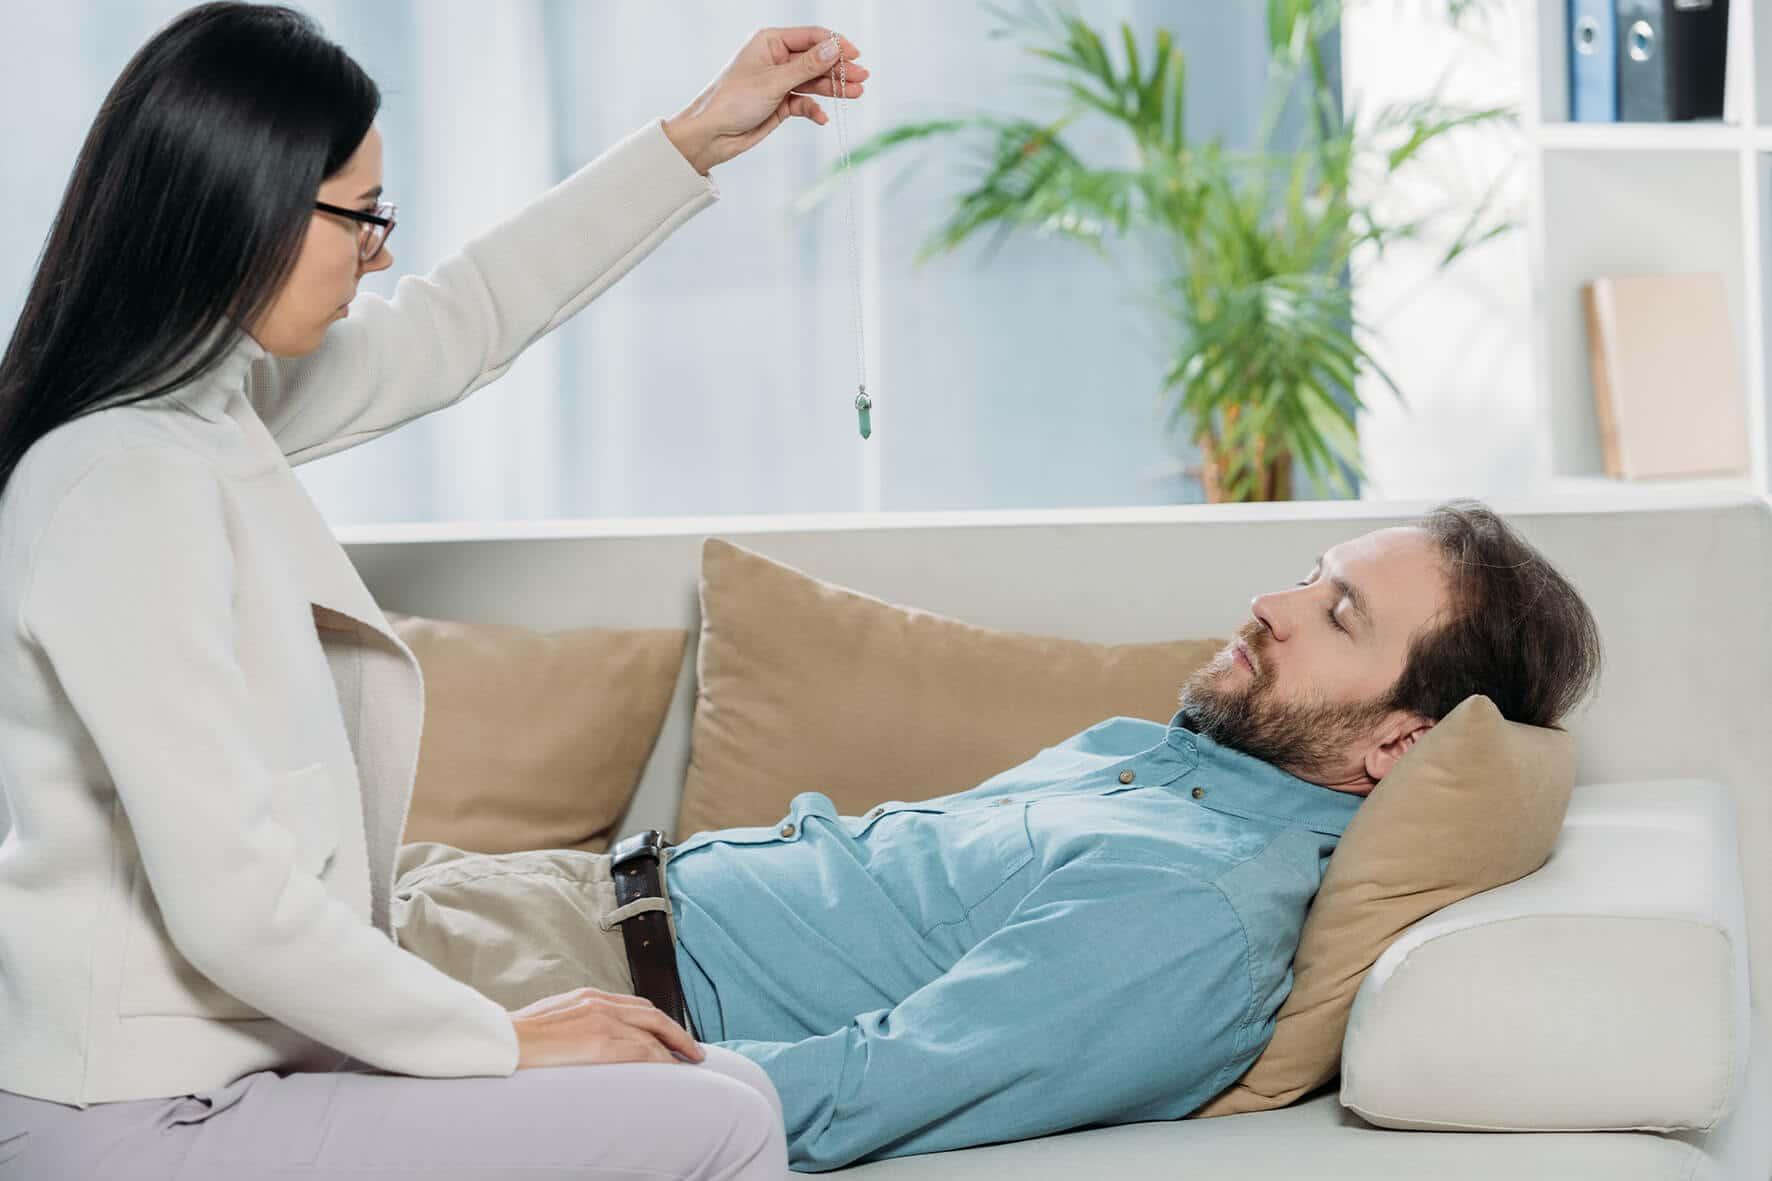 Fokuskurs Hypnose - der medizinische Block